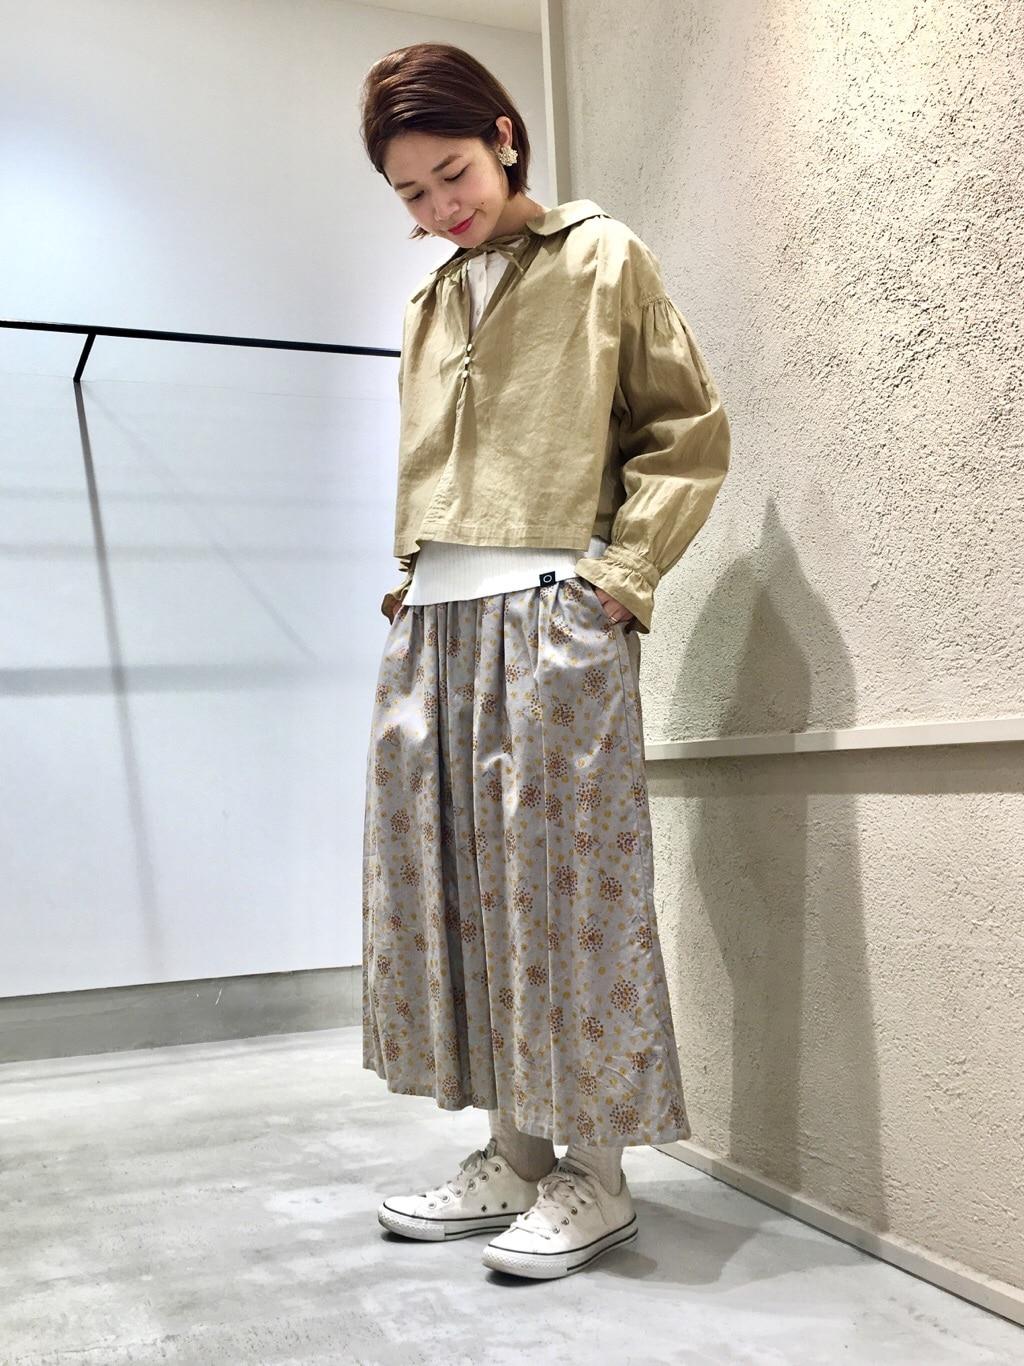 chambre de charme 横浜ジョイナス 身長:160cm 2020.12.29